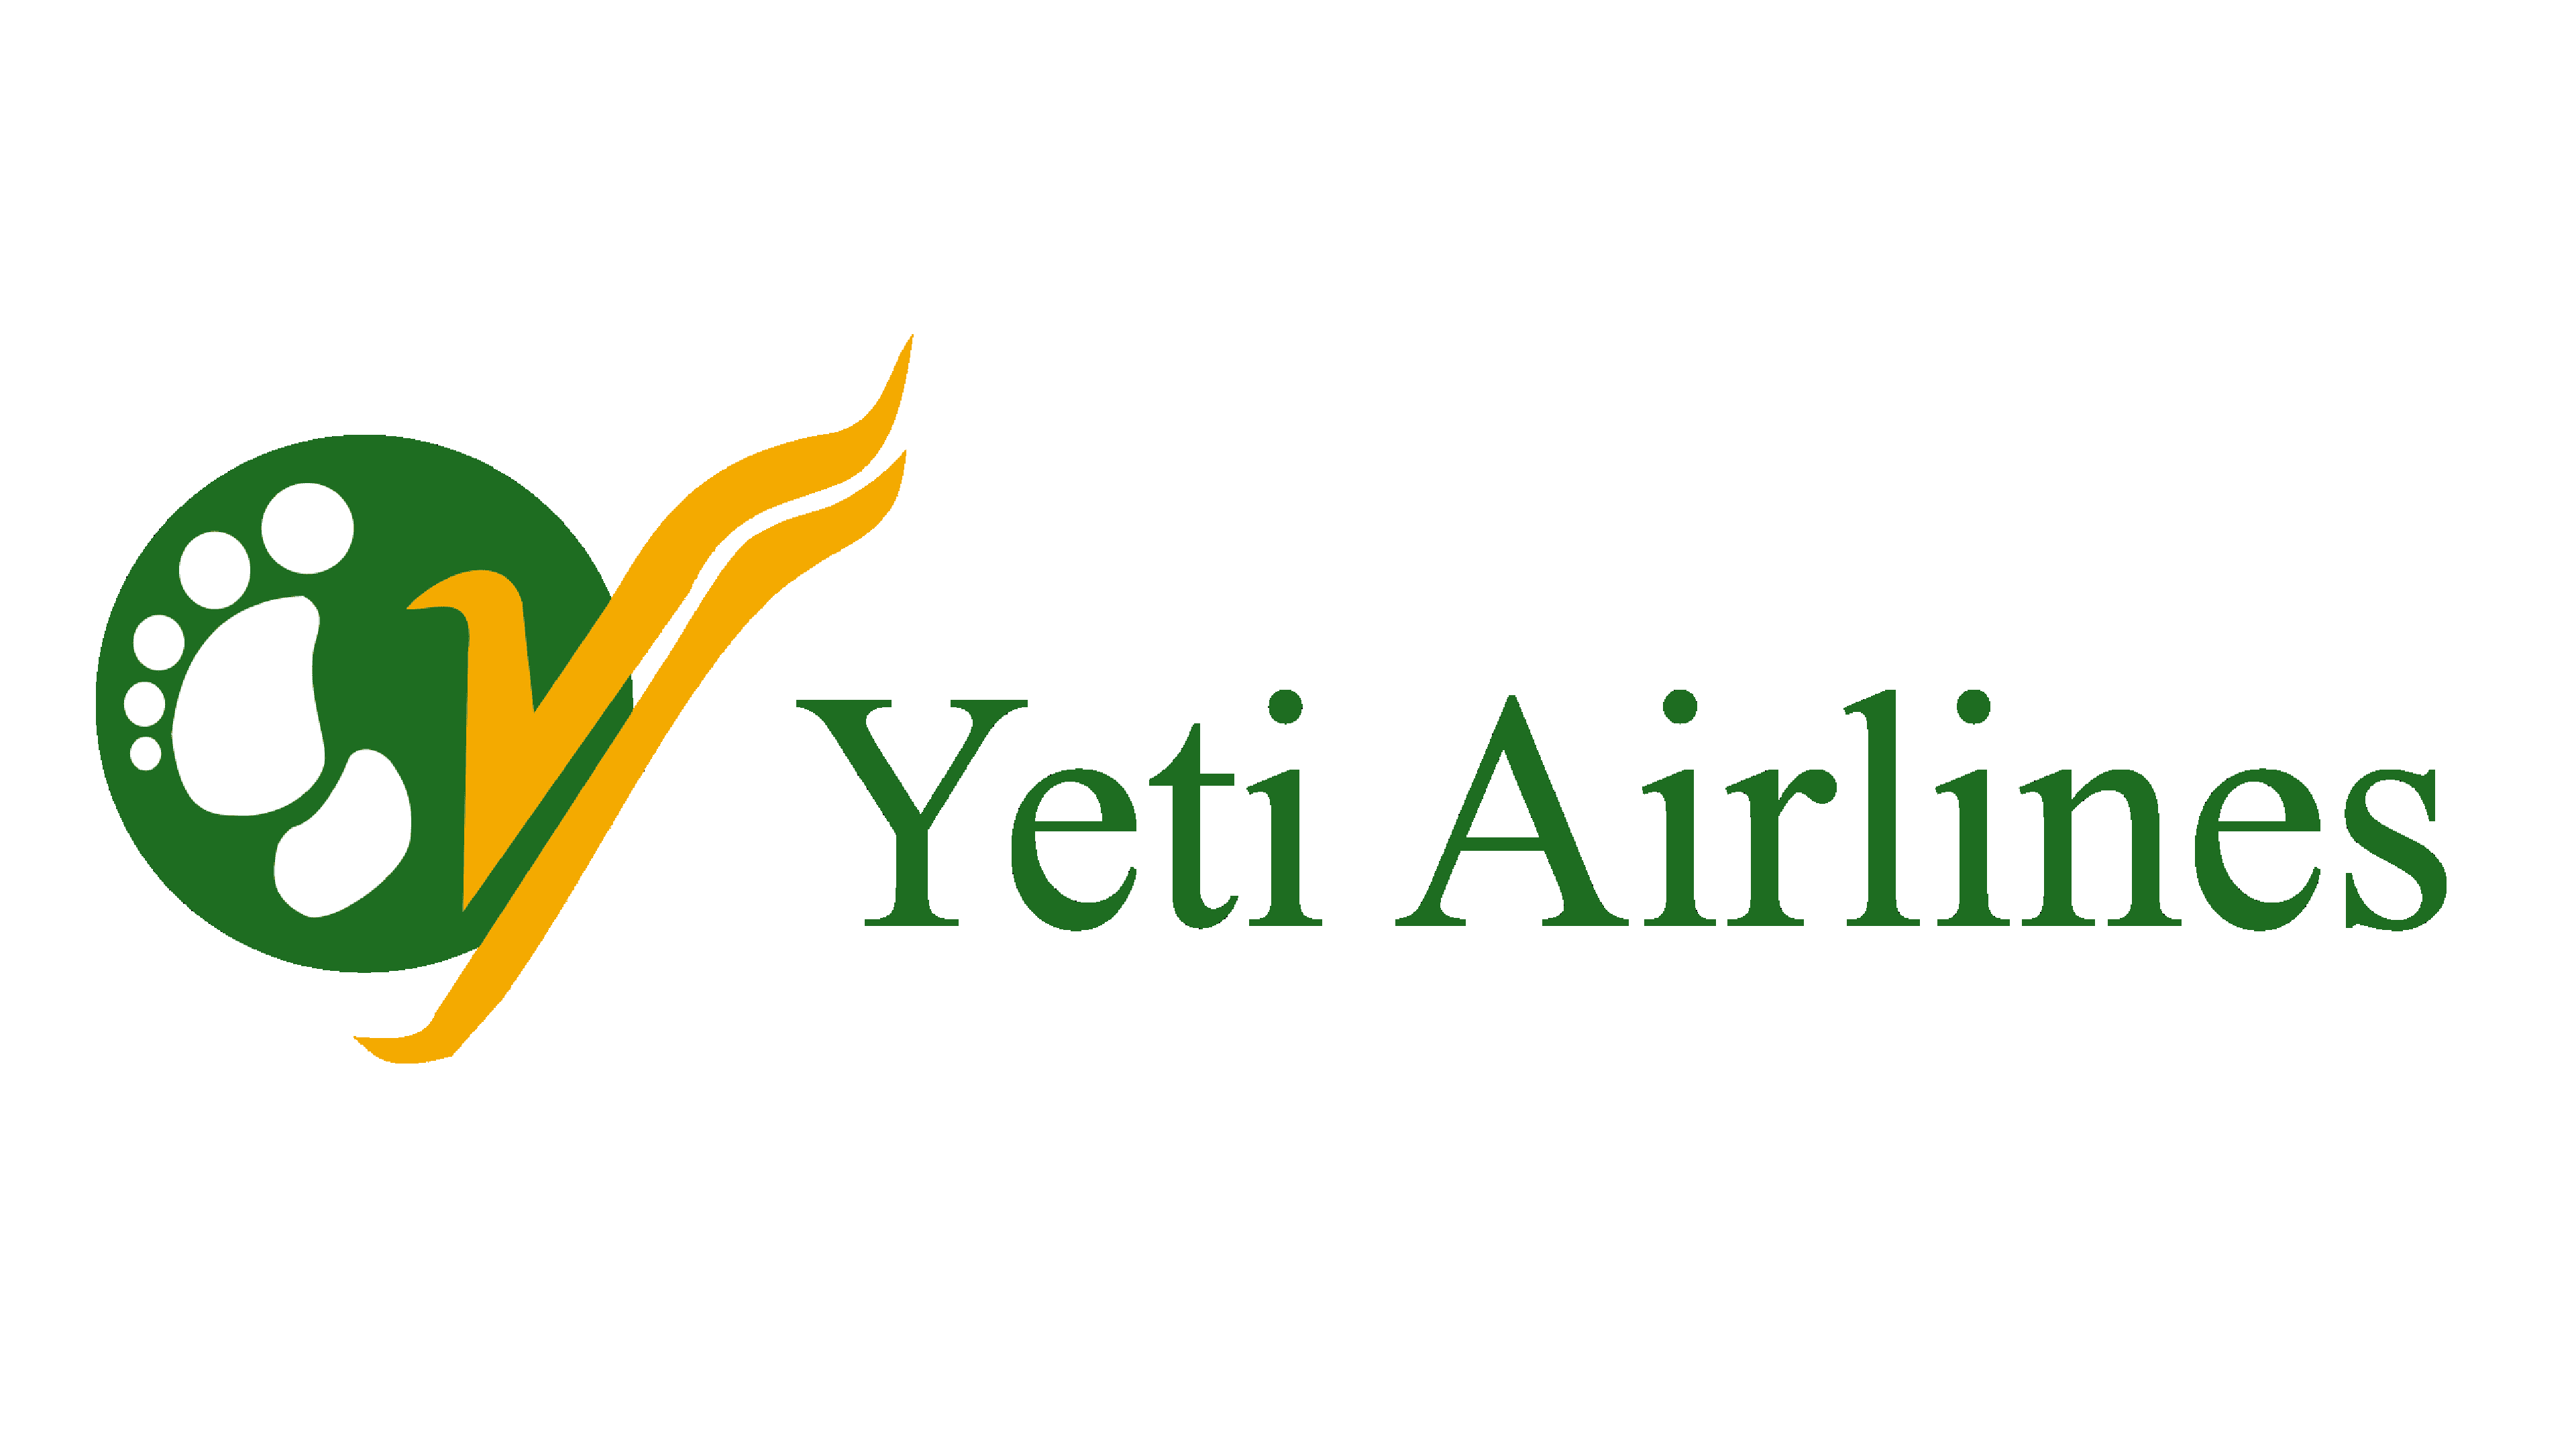 Yeti Airlines Logo Logo